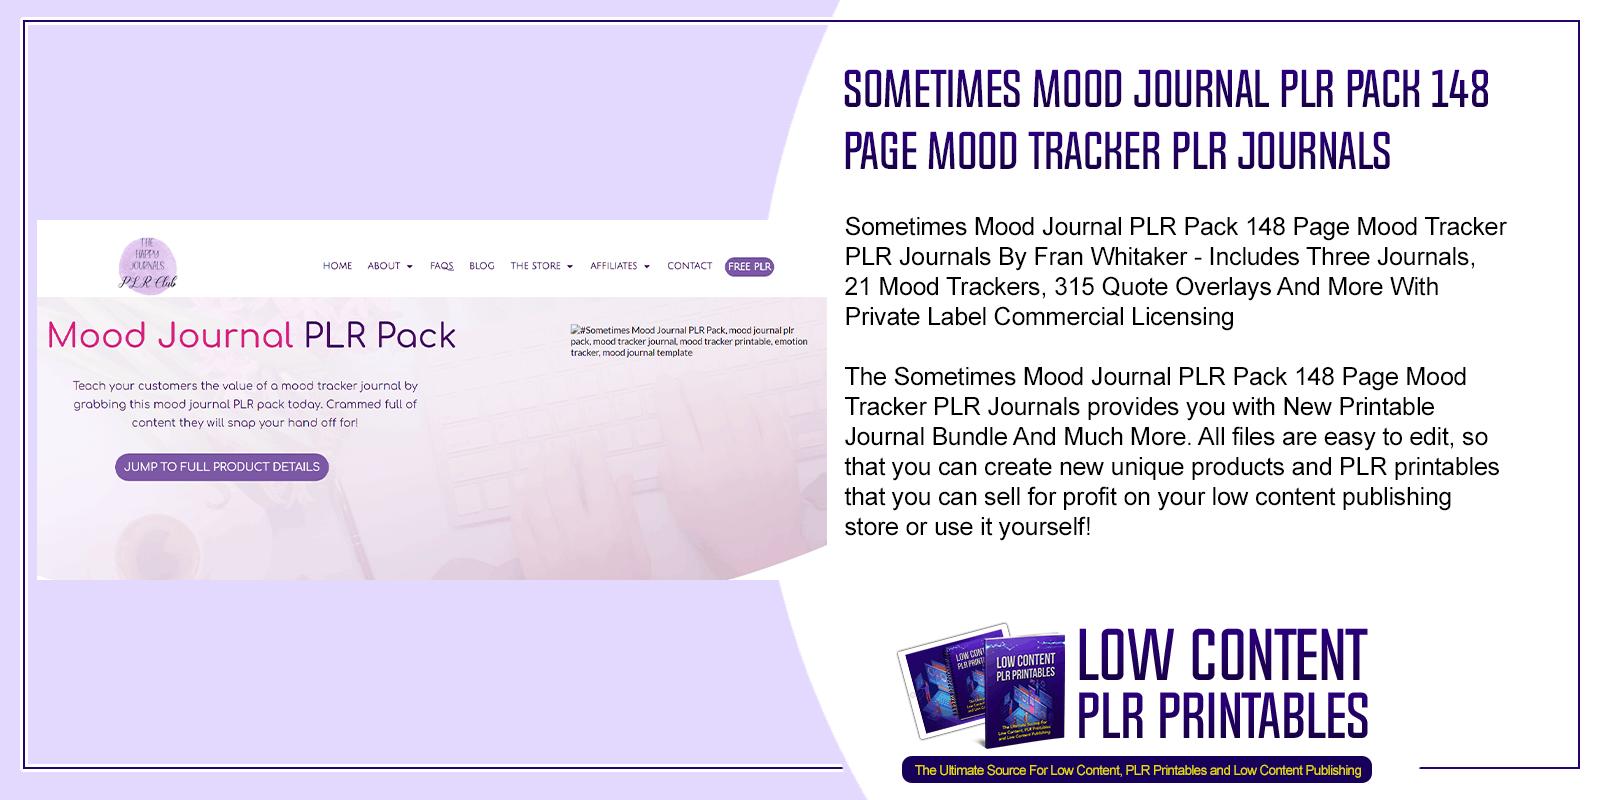 Sometimes Mood Journal PLR Pack 148 Page Mood Tracker PLR Journals